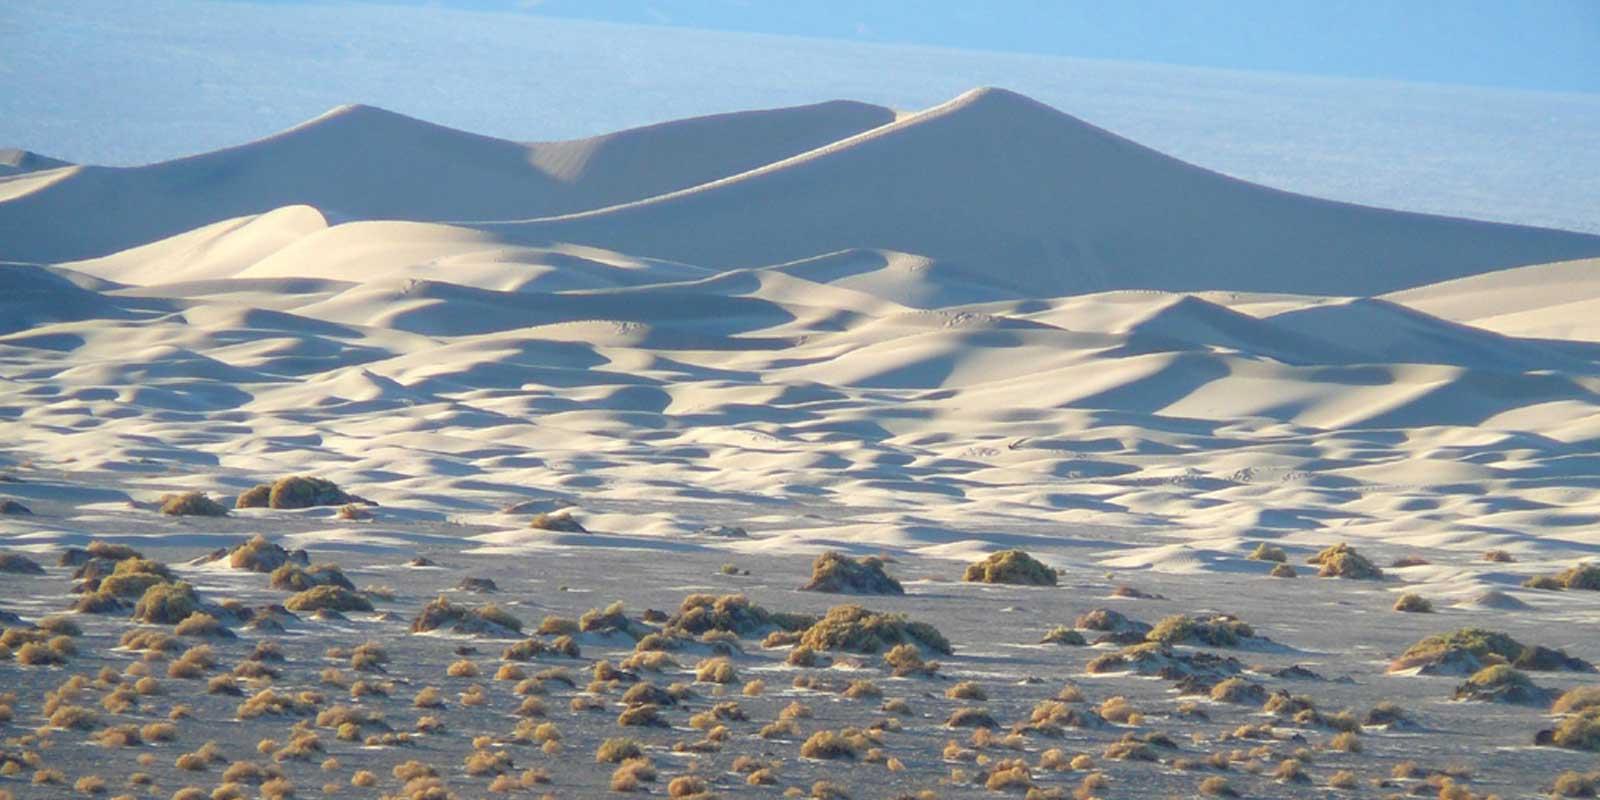 Landscape photo of sand dunes at Death Valley National Park